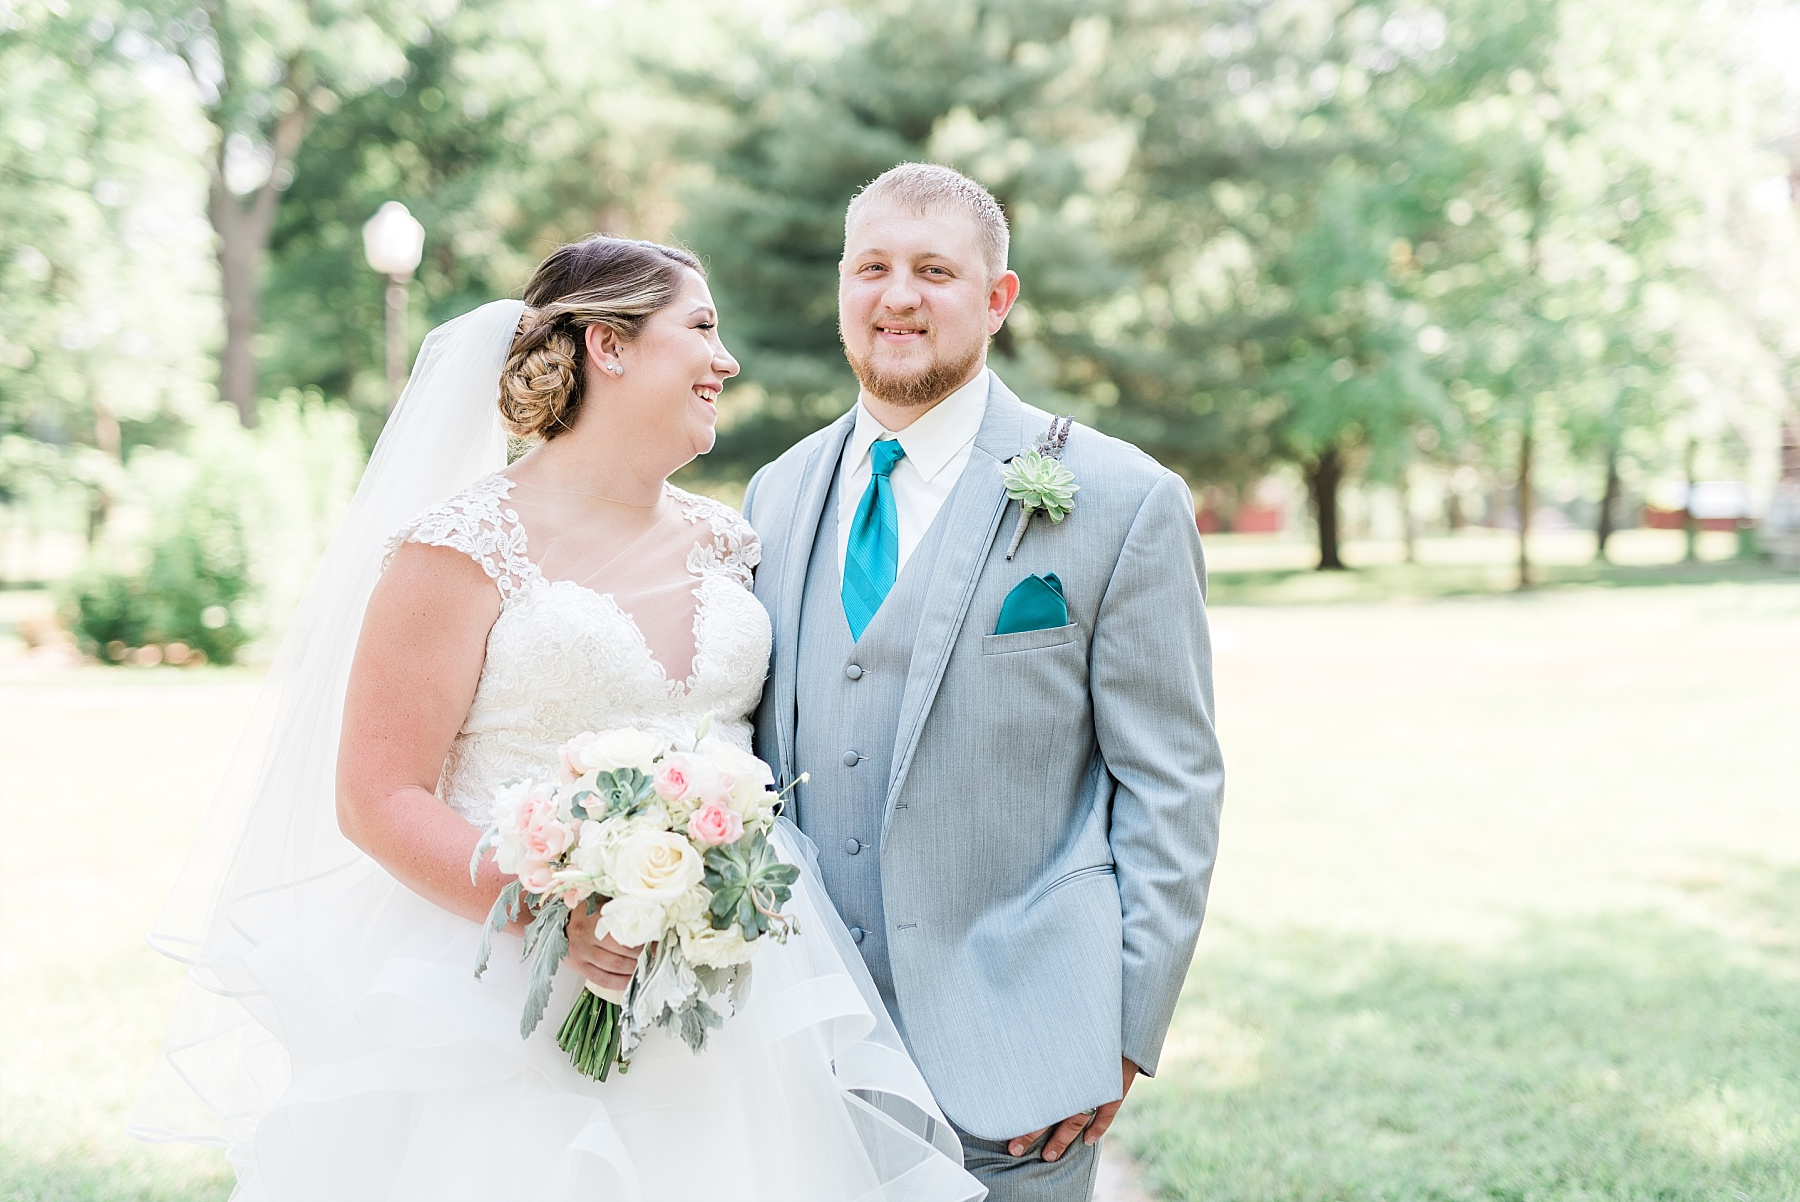 Baurichter Wedding at Stoney Creek Inn Columbia Missouri by Kelsi Kliethermes Photography_0018.jpg